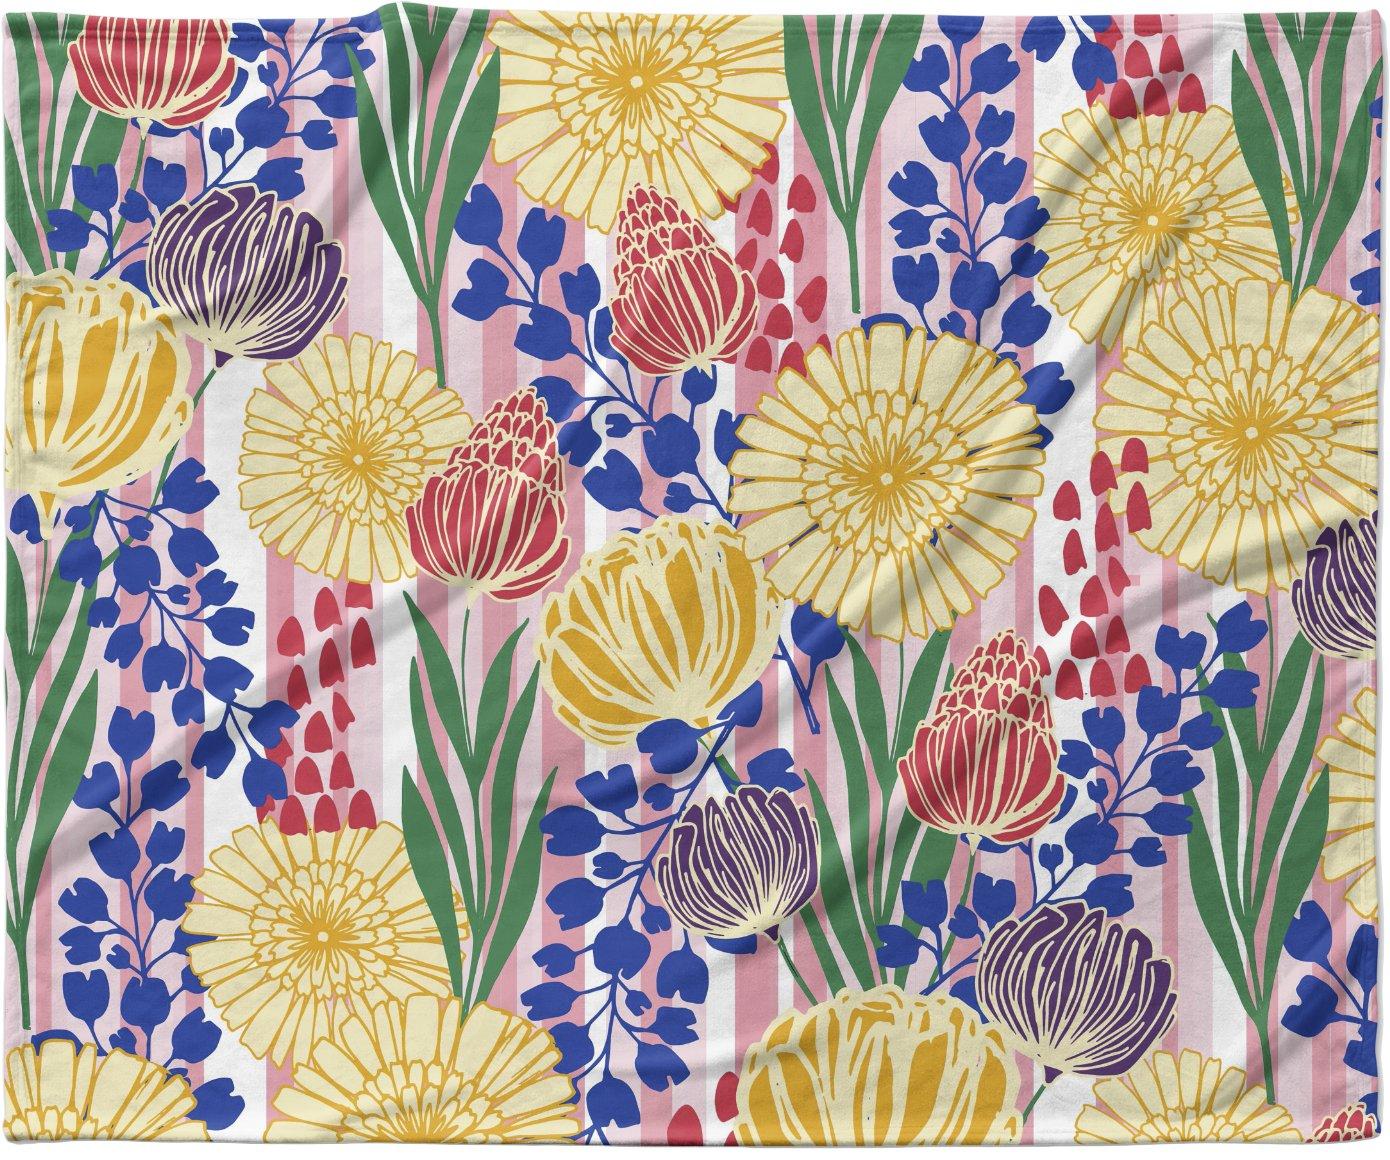 KESS InHouse Amy Reber 'Pretty Bouquet' Yellow Floral Fleece Baby Blanket, 40' x 30'